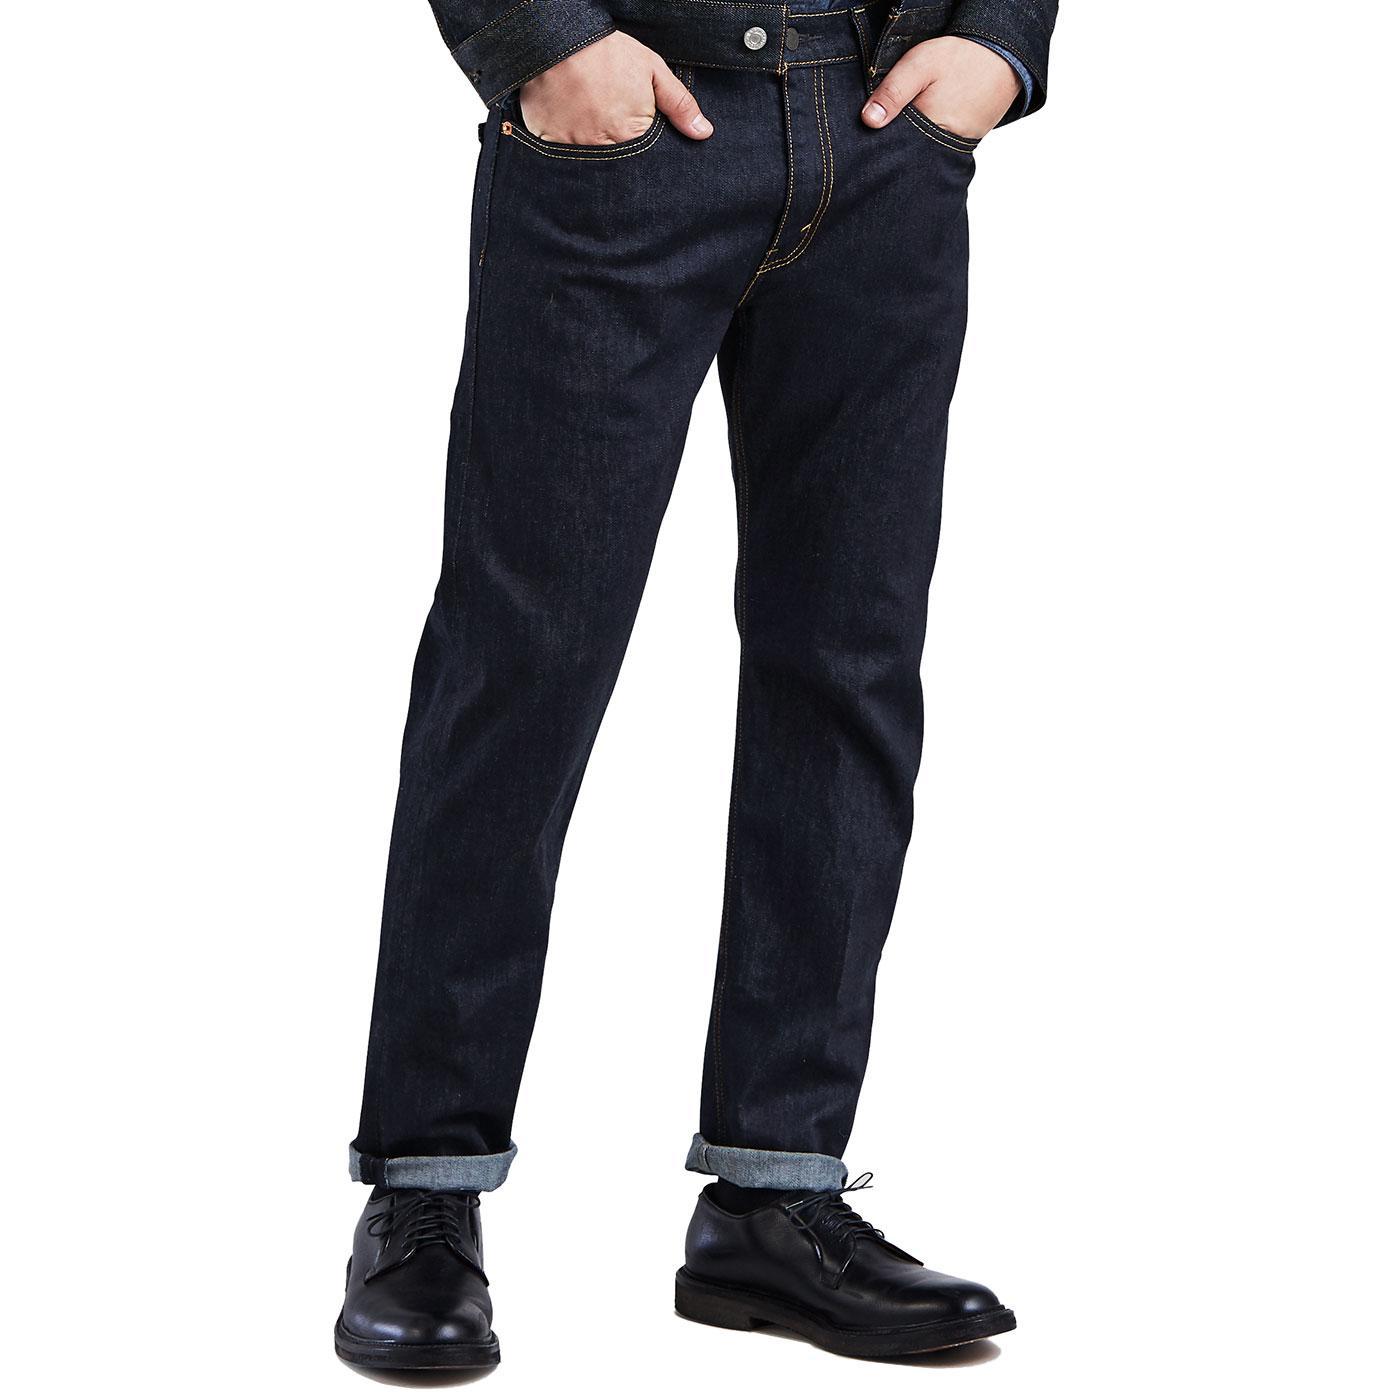 LEVI'S 502 Taper Fit Denim Jeans (Rock Cod)